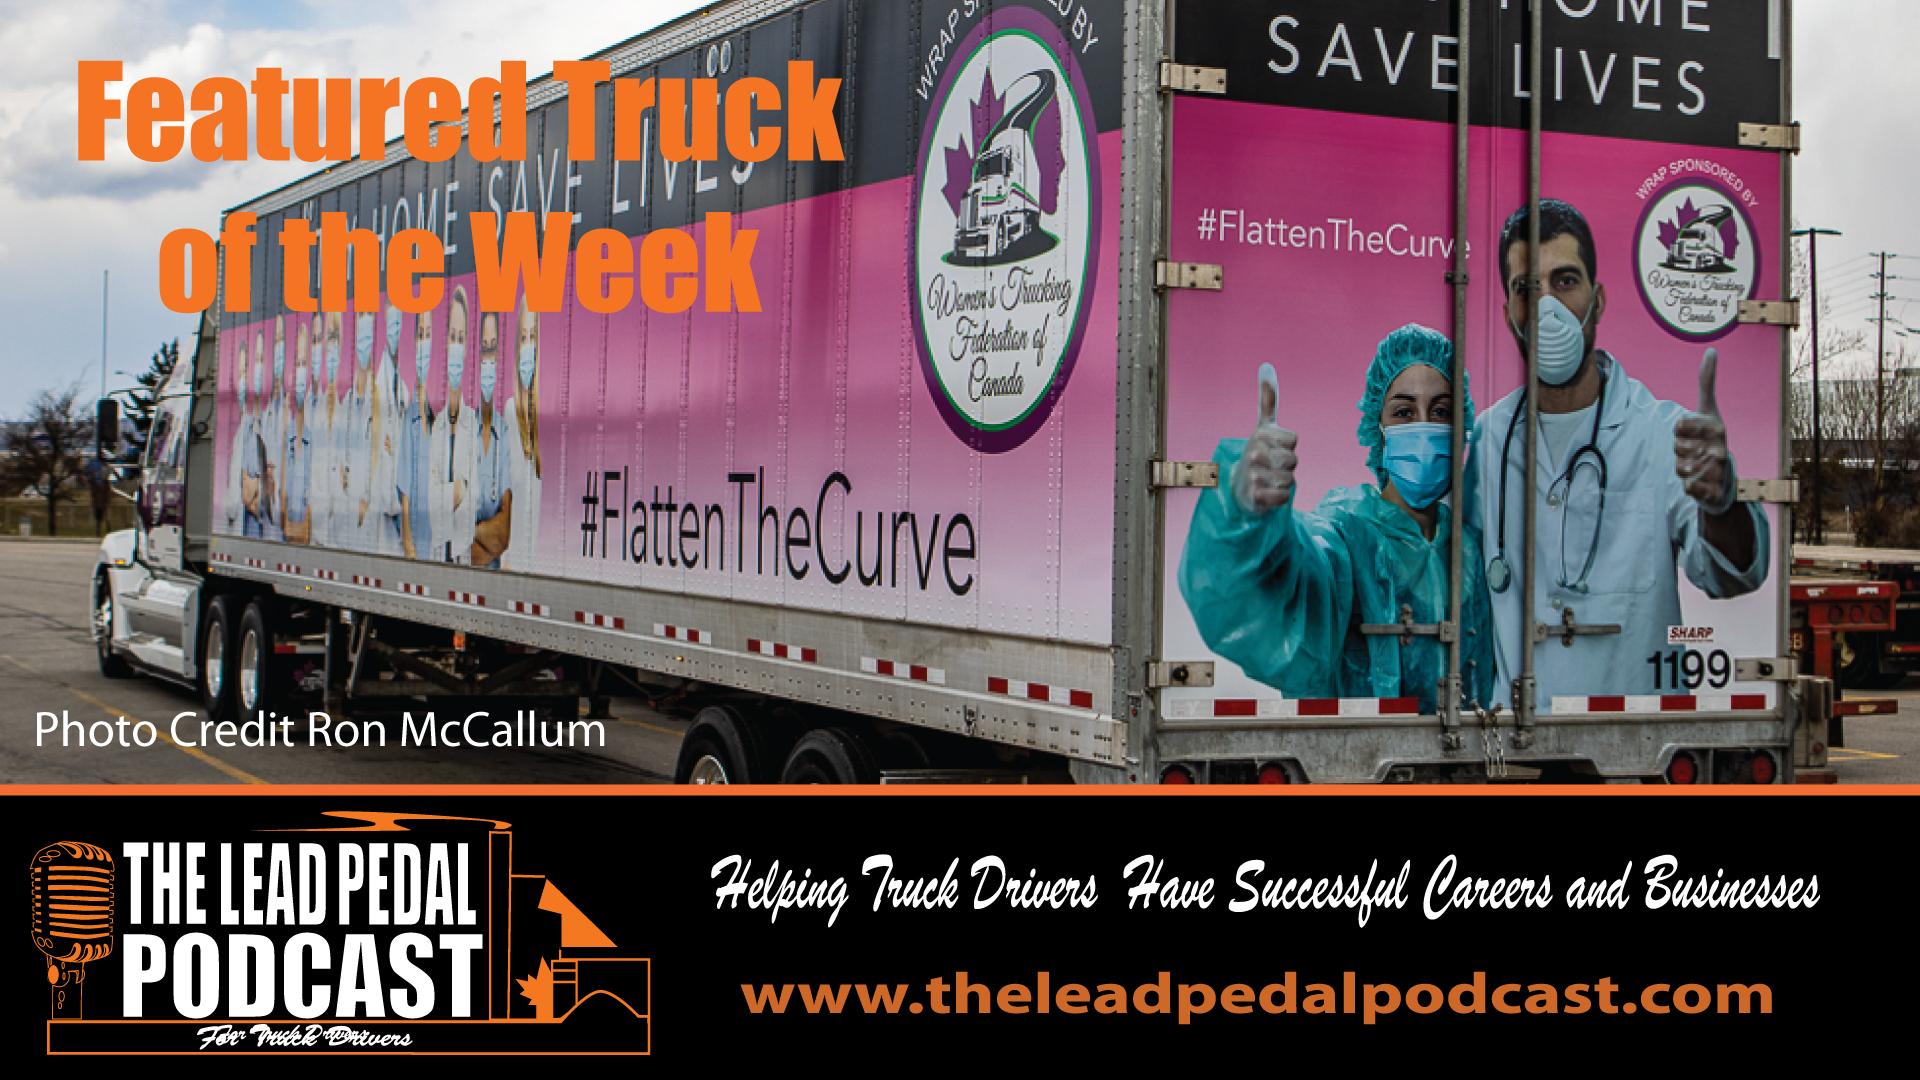 Flatten the Curve-Featured truck